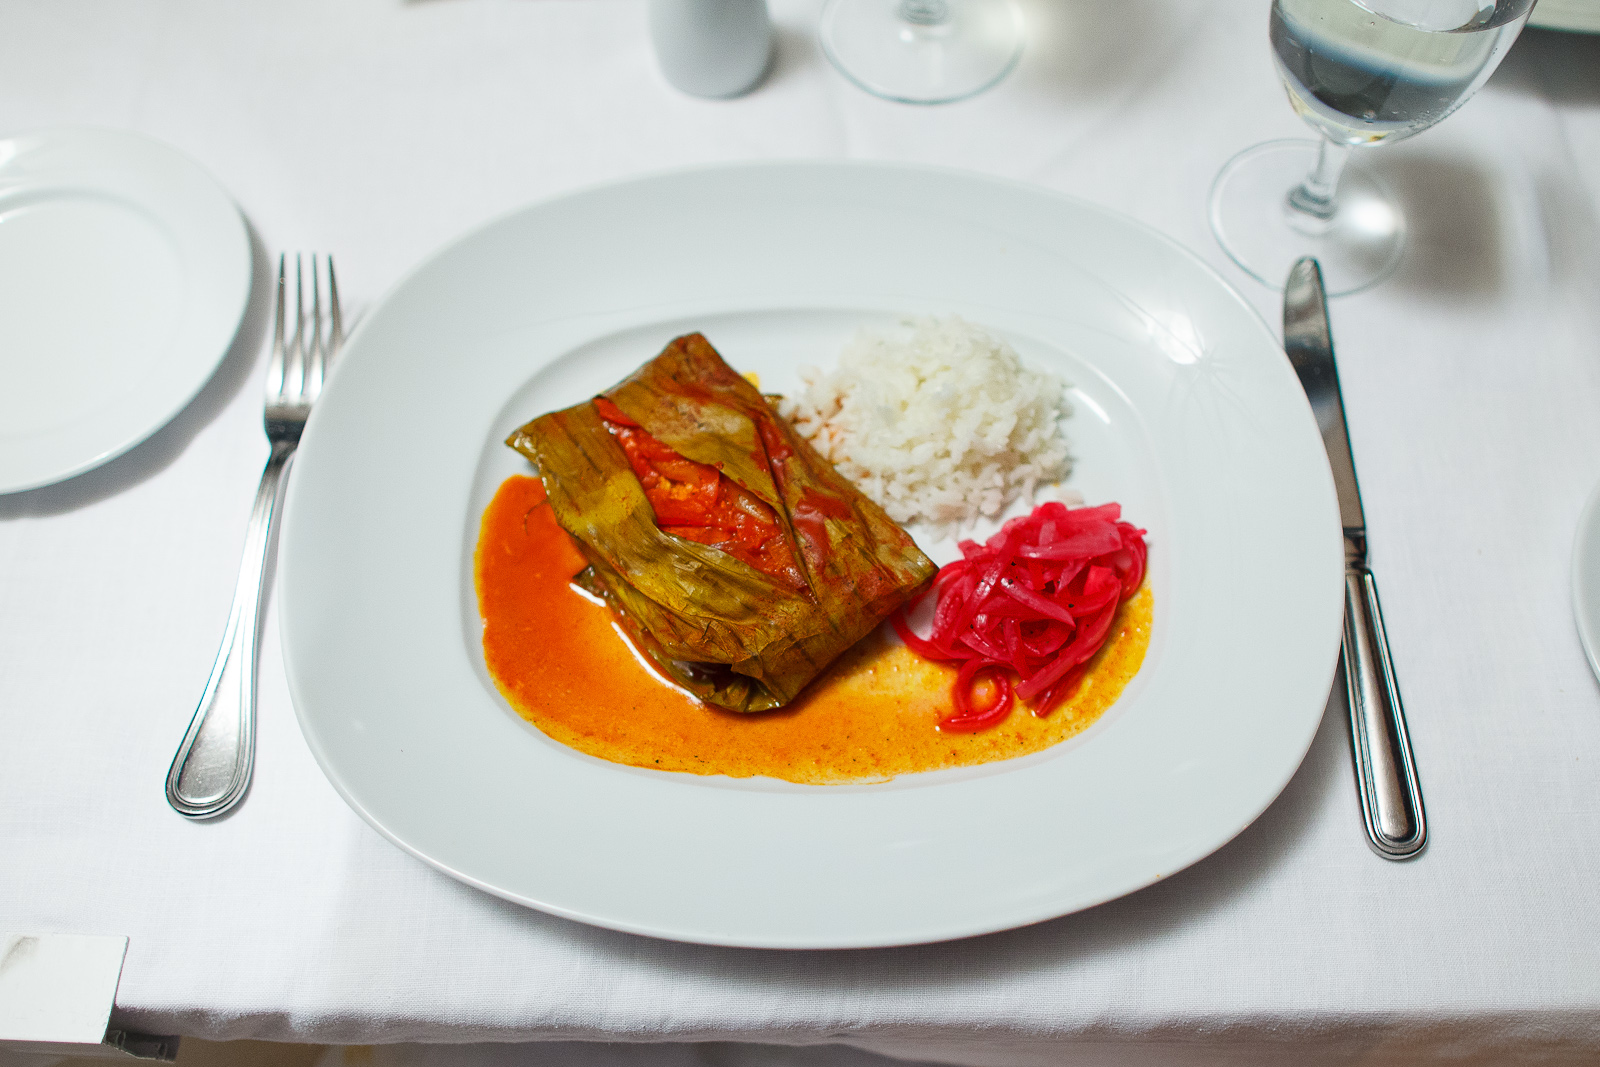 Tikin-xic - Huachinango marinado en achiote envuelto en hoja de